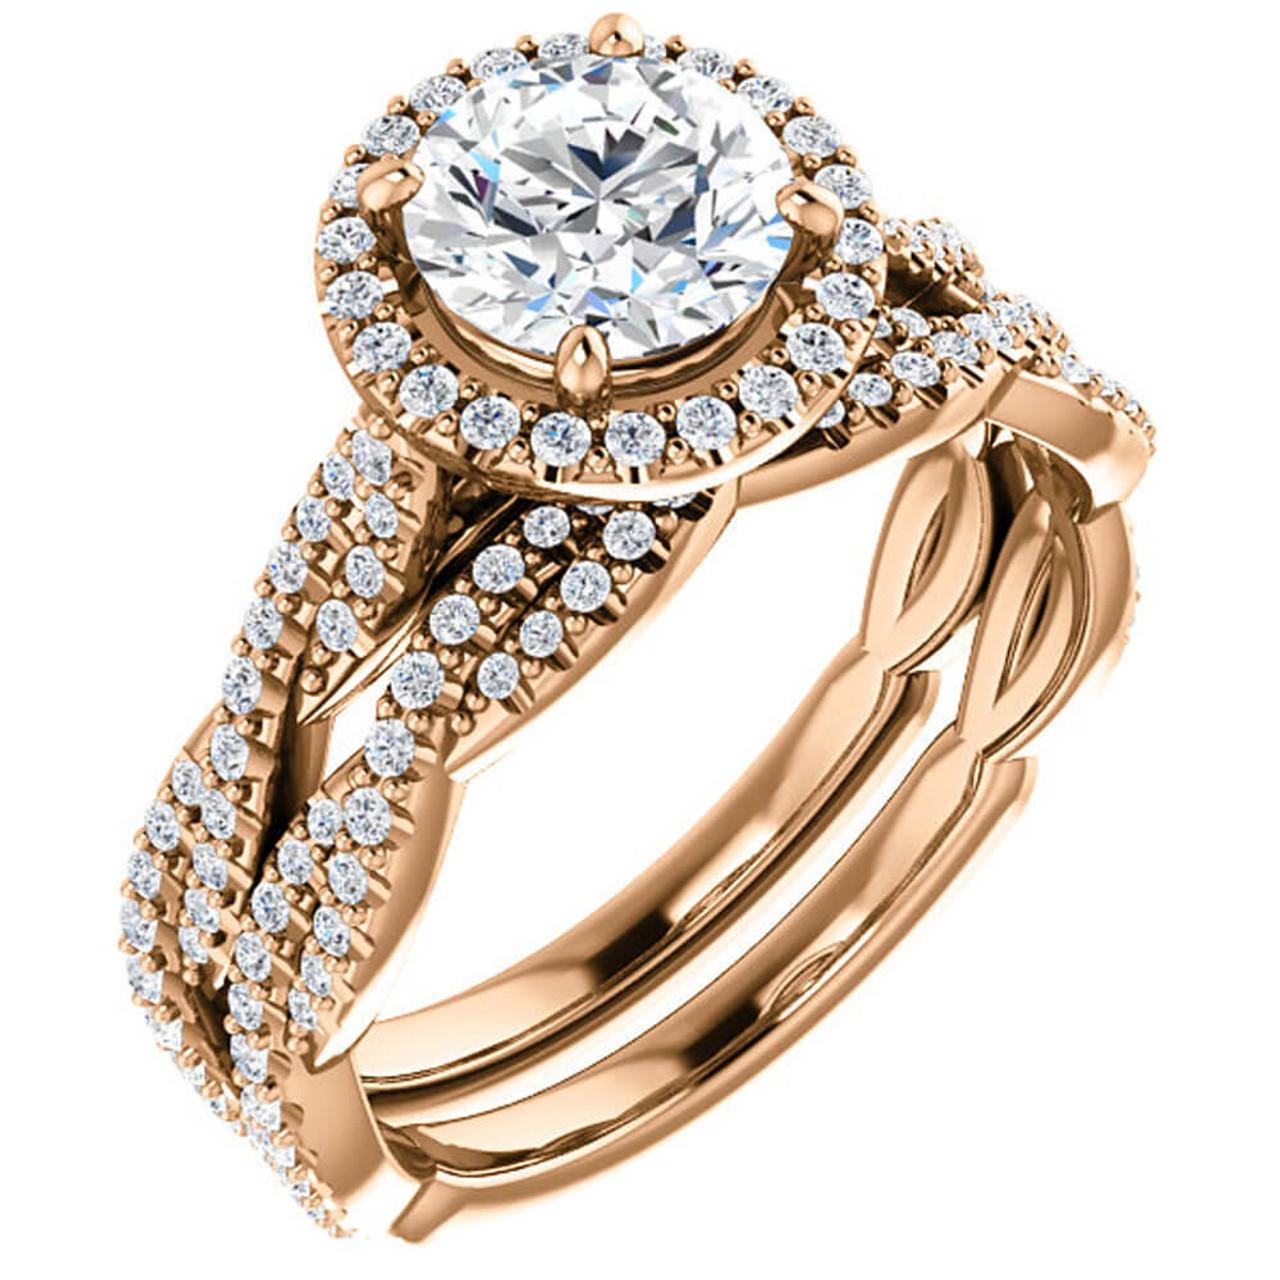 1 1 2ct Diamond Halo Vine Engagement Wedding Ring Set 14k Rose Gold